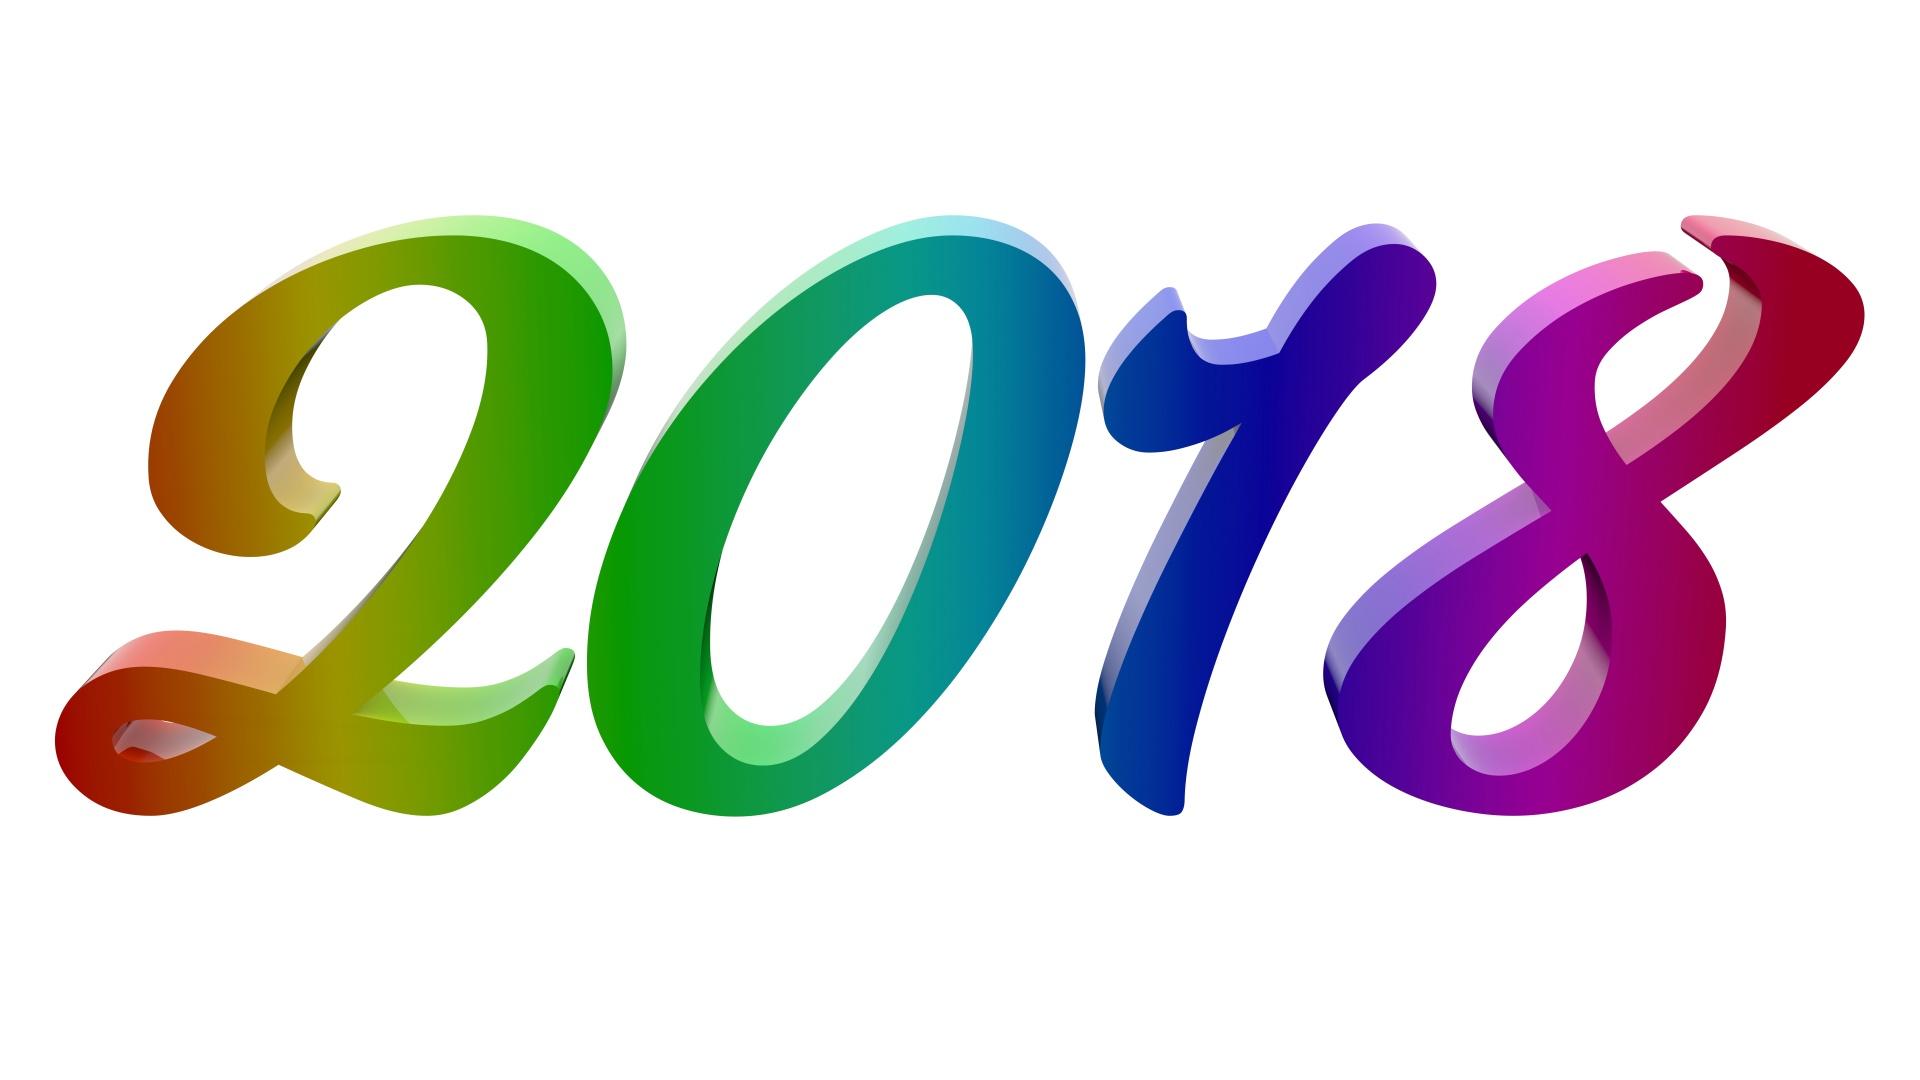 New Year Number Illustration Free Stock Photo